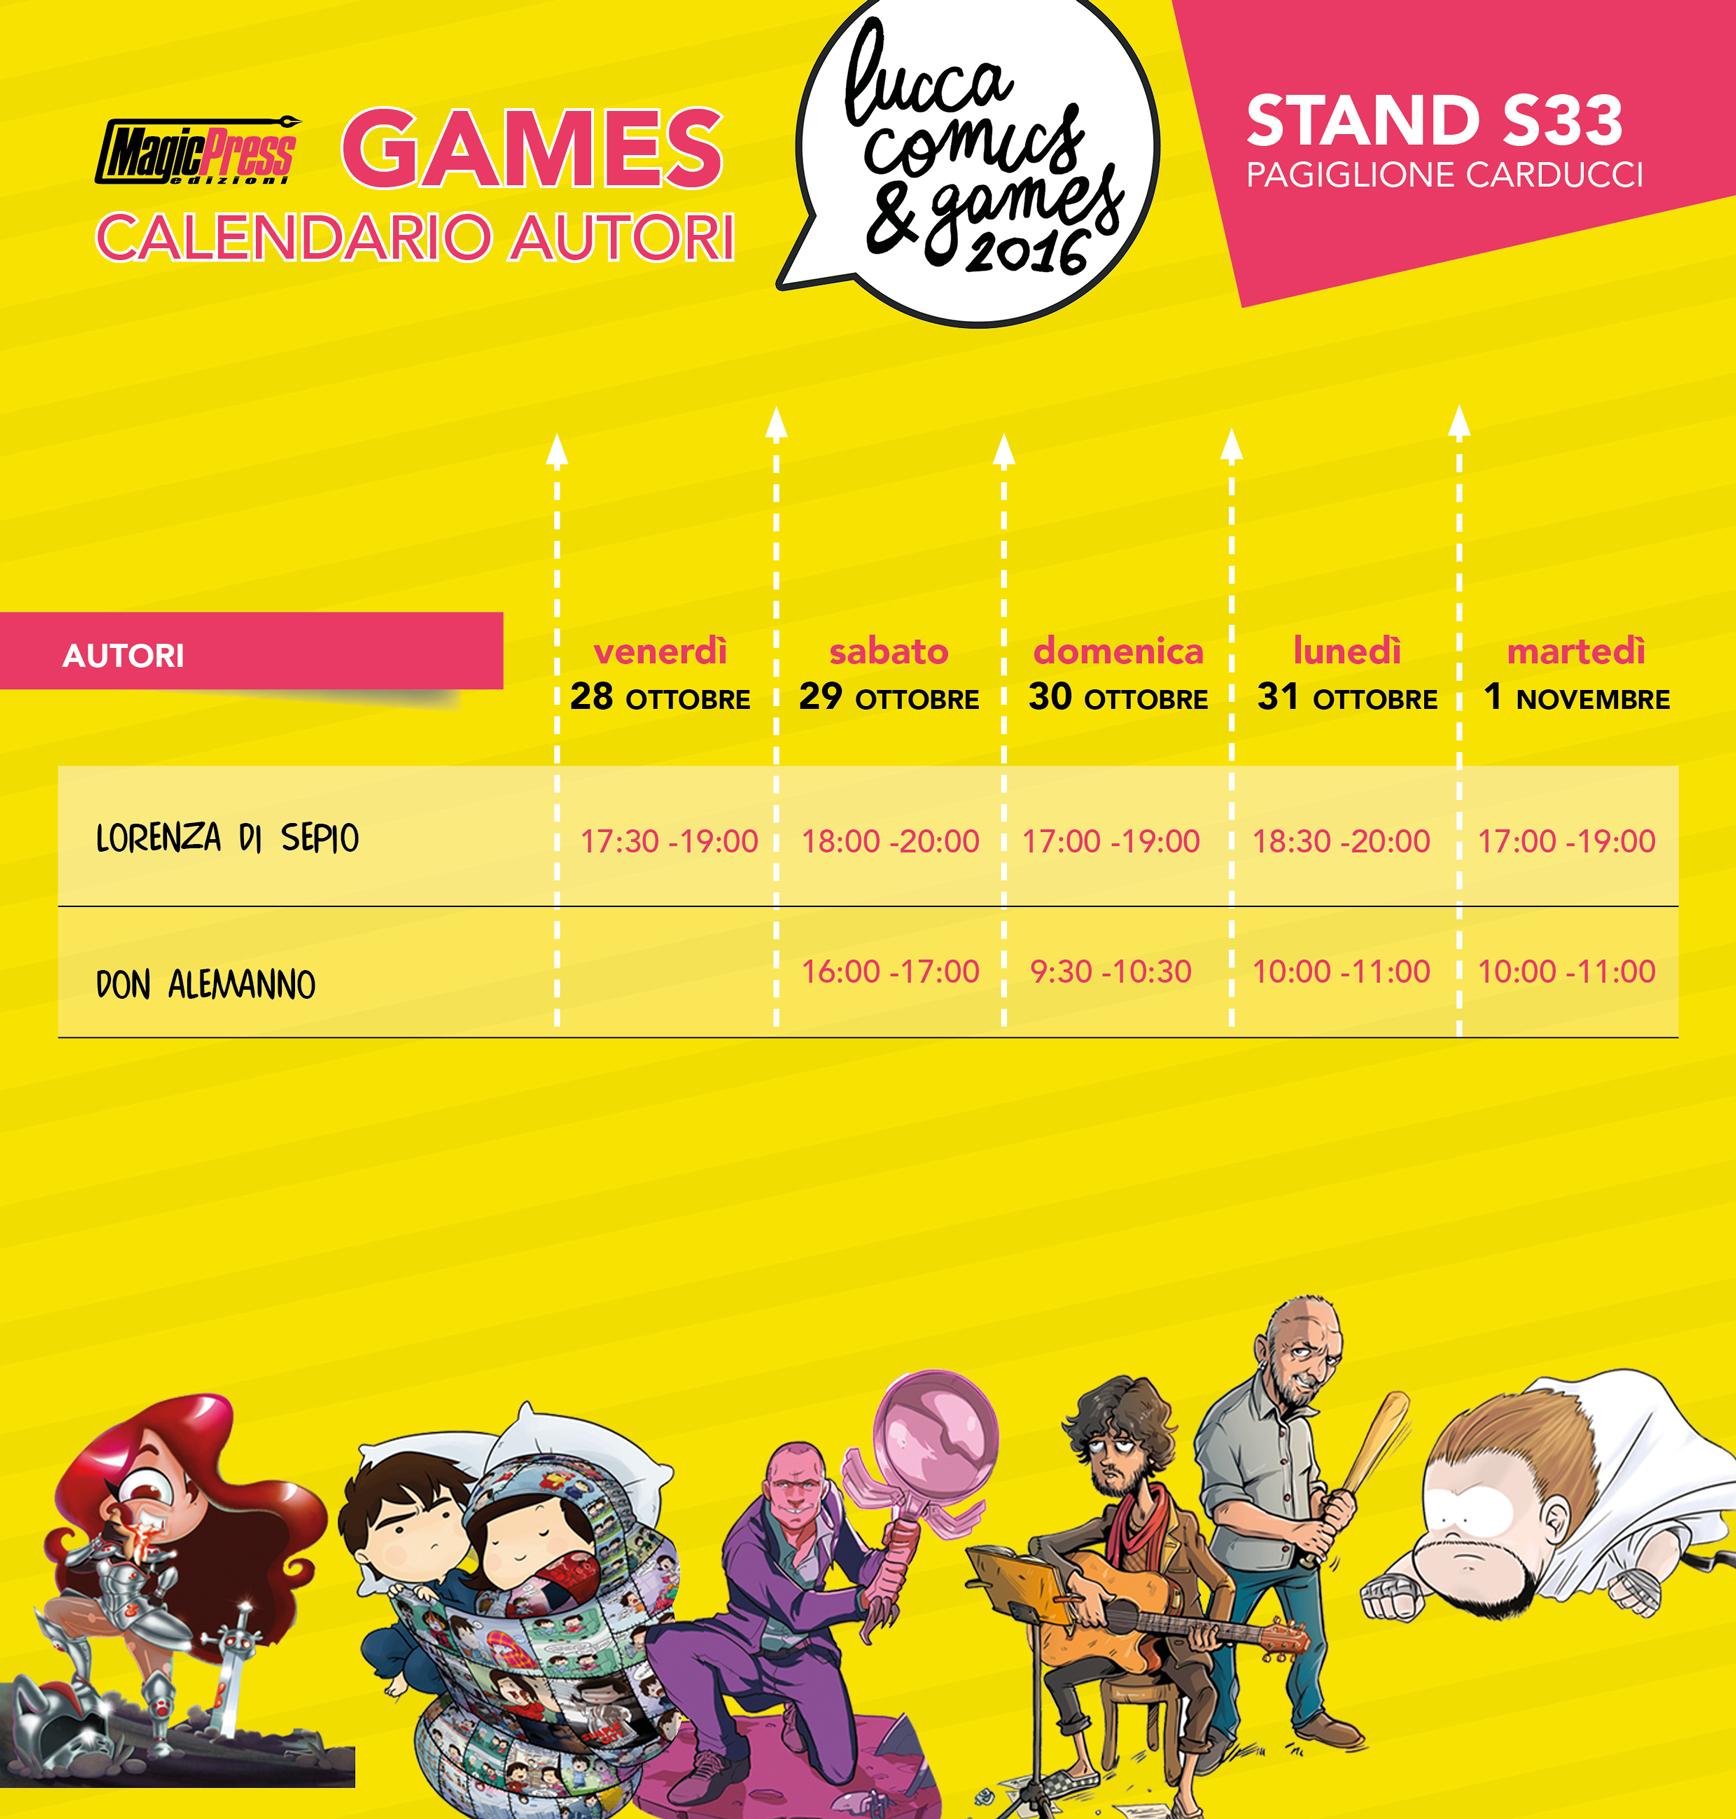 calendario-giochi_lucca2016_games